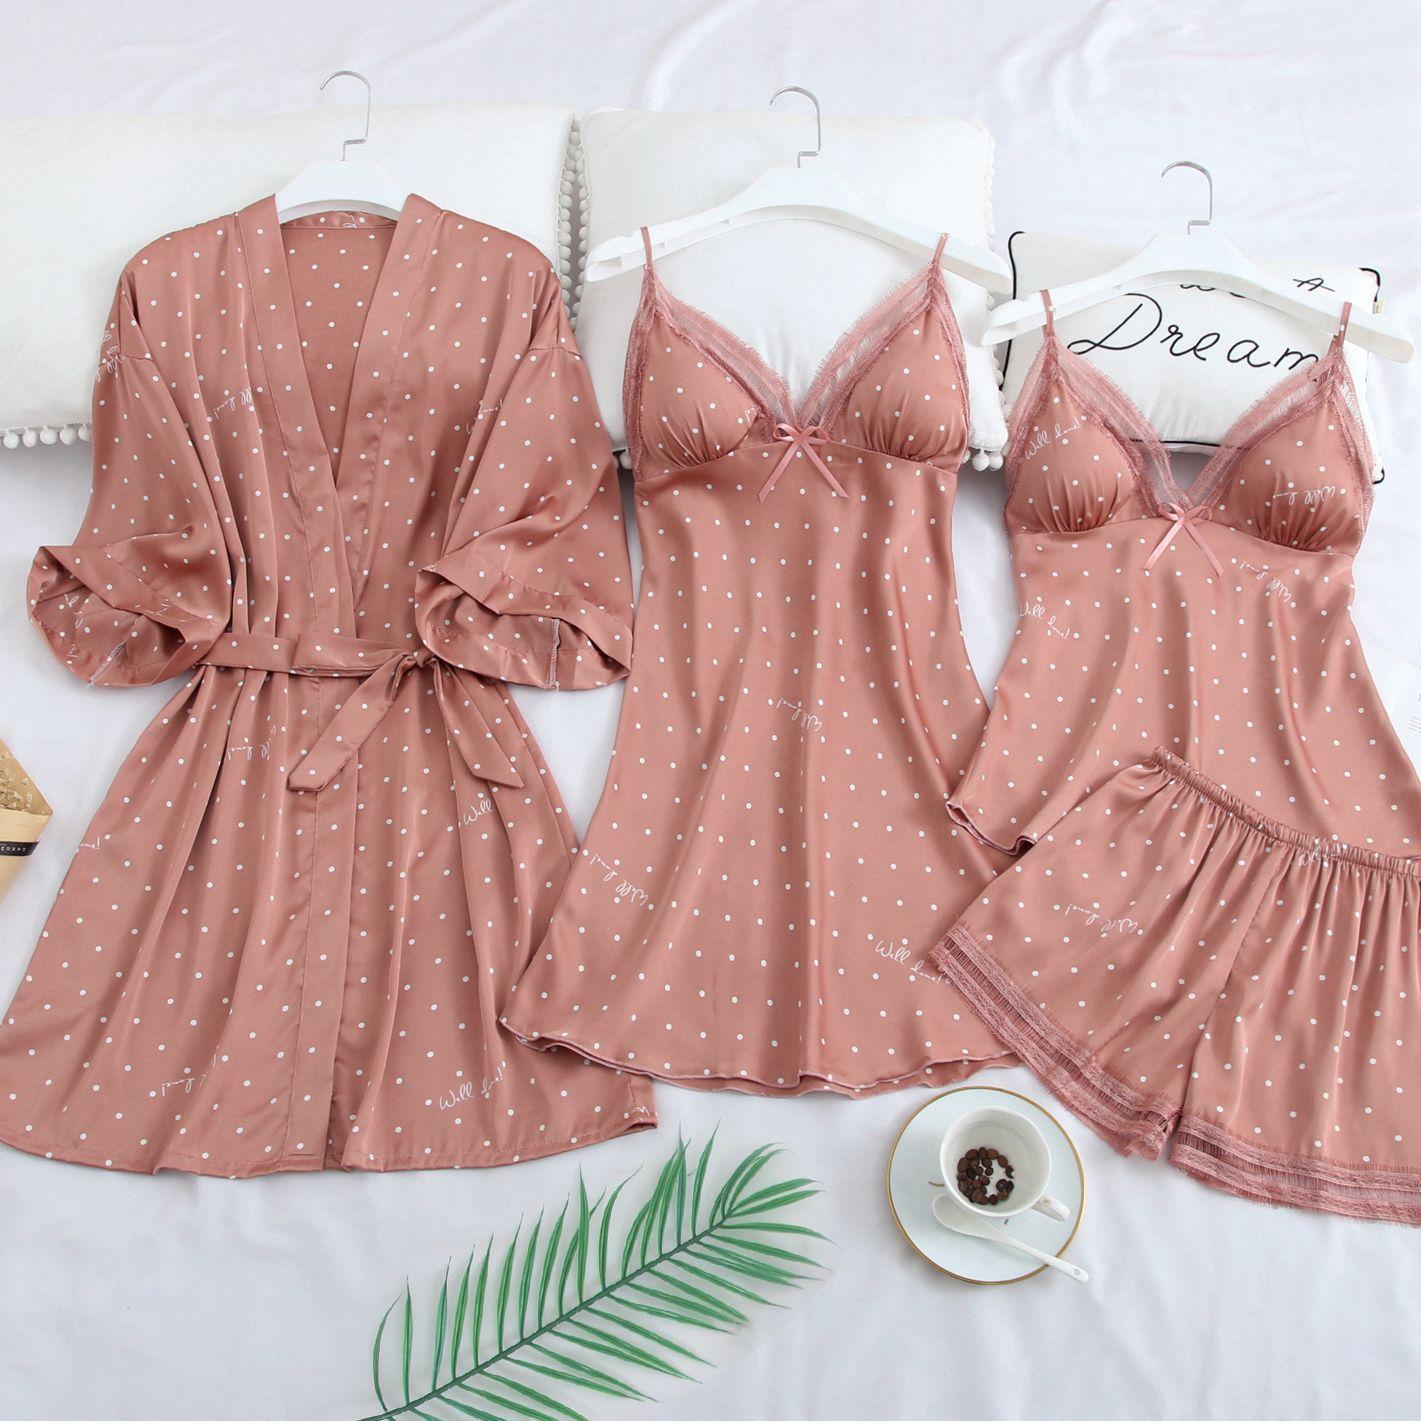 Rosa impressão dot casamento robe conjunto sleepwear casual lingerie íntima camisola de noite macio homewear casa roupas quimono vestido